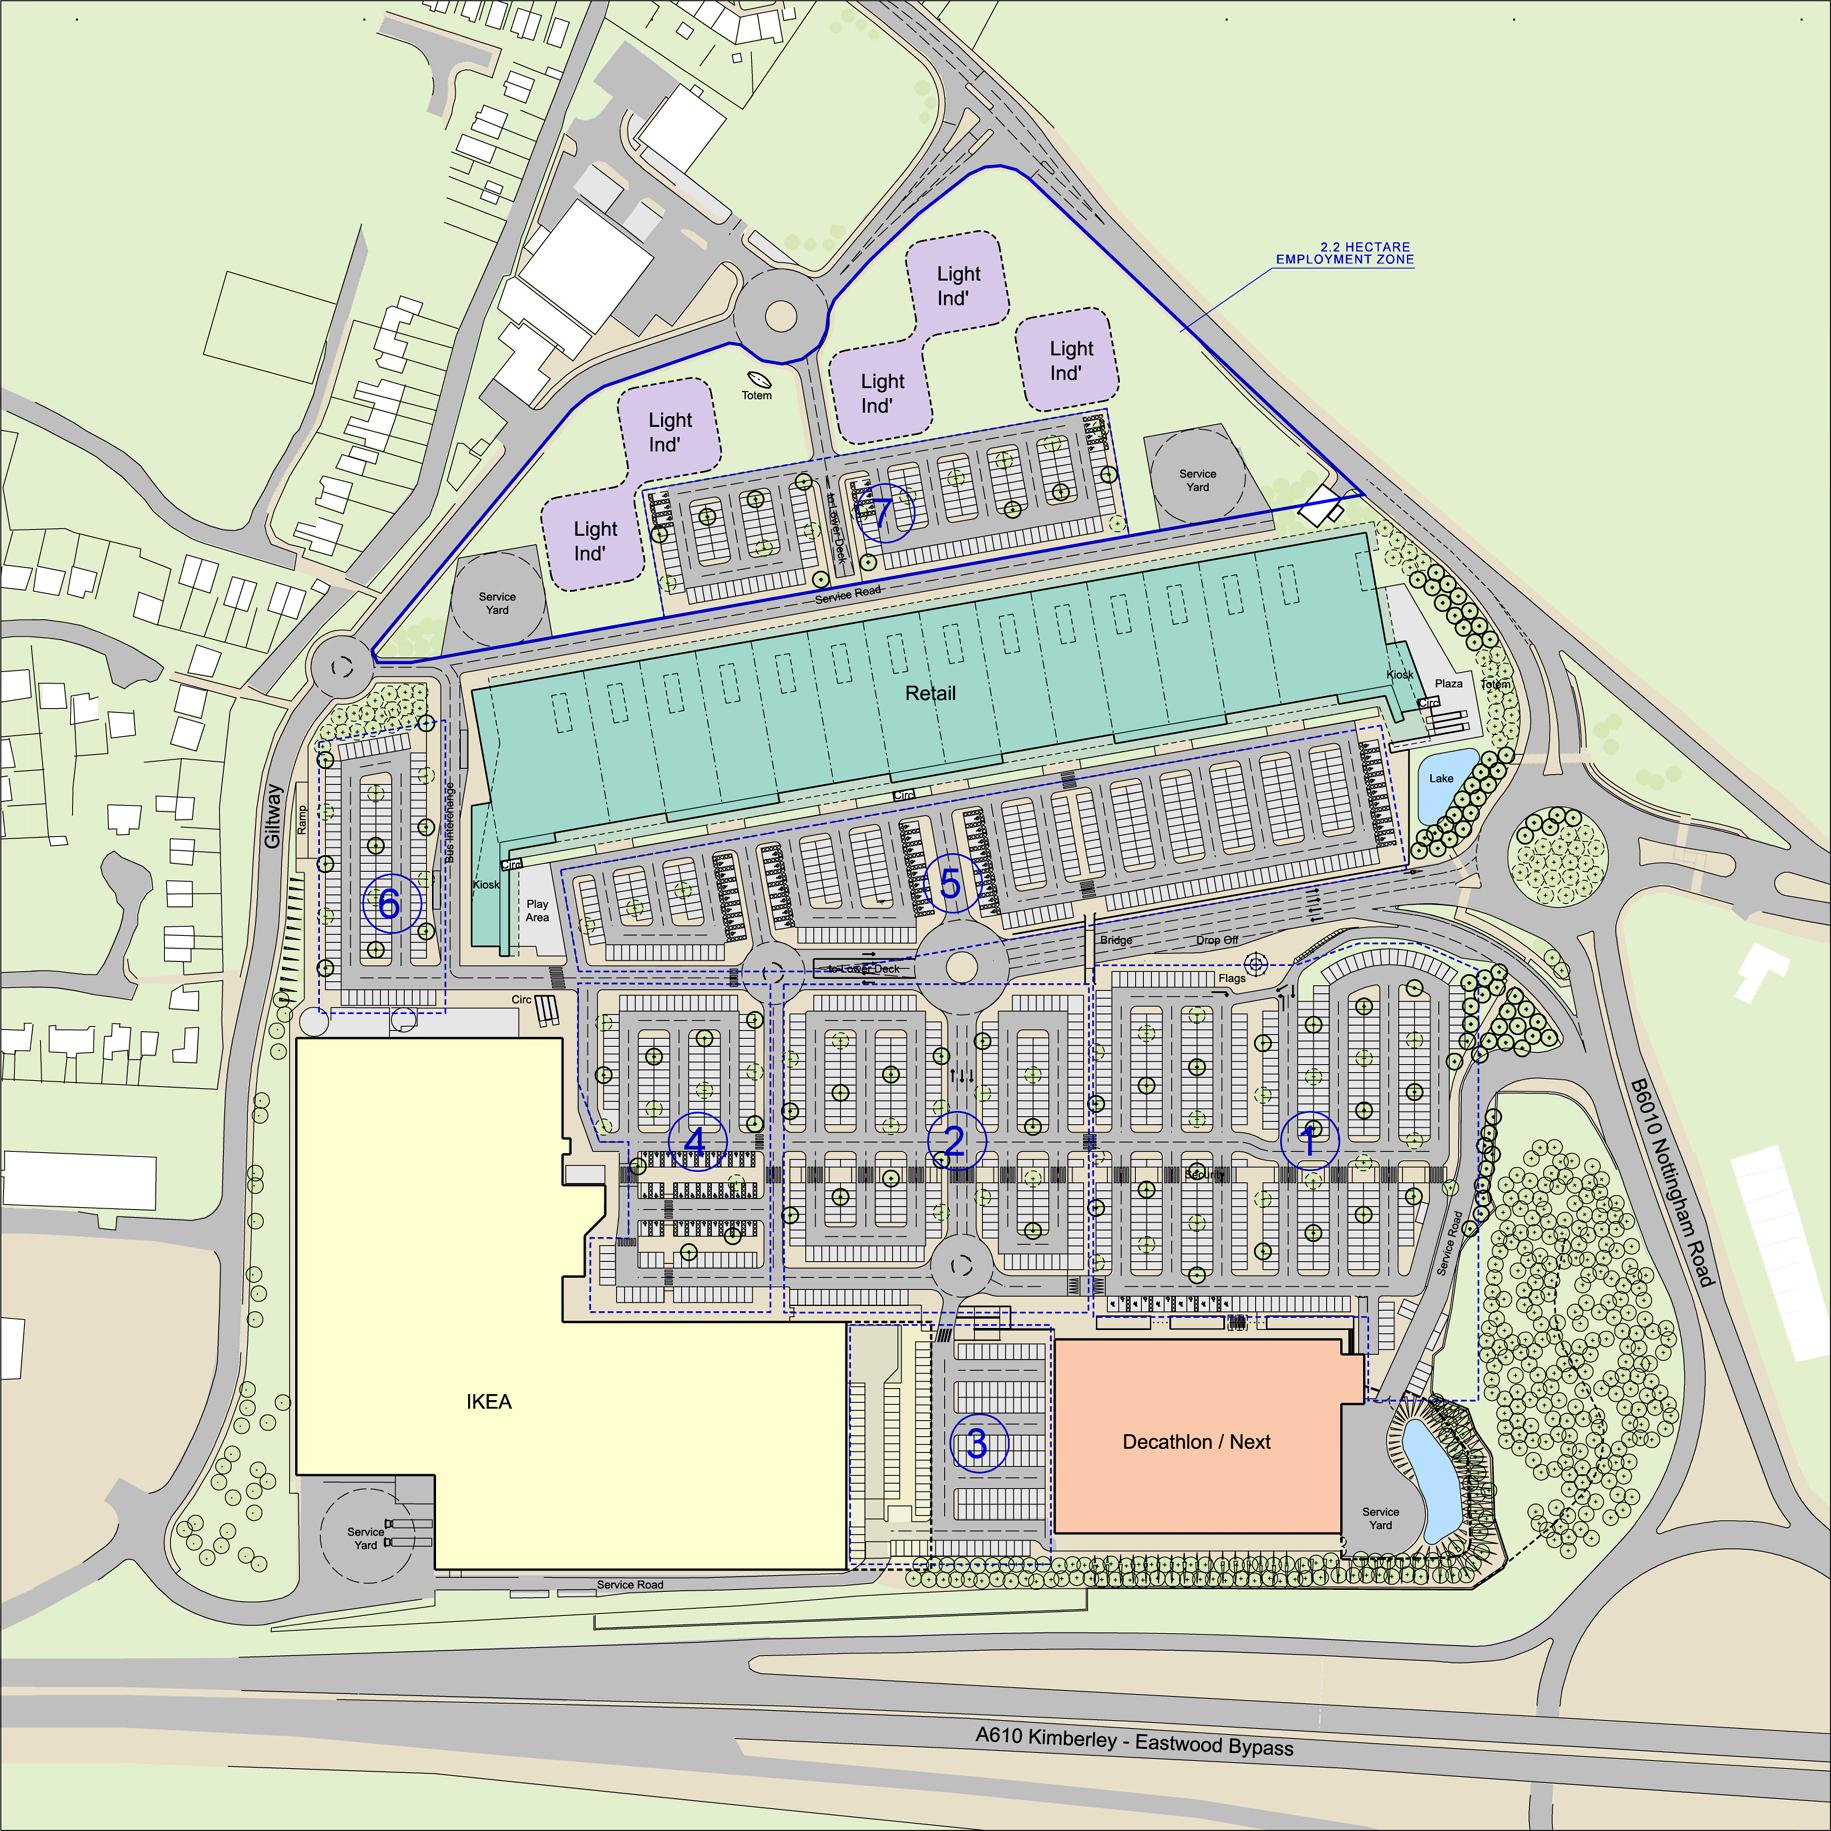 IKEA Giltbrook Retail Park Masterplan